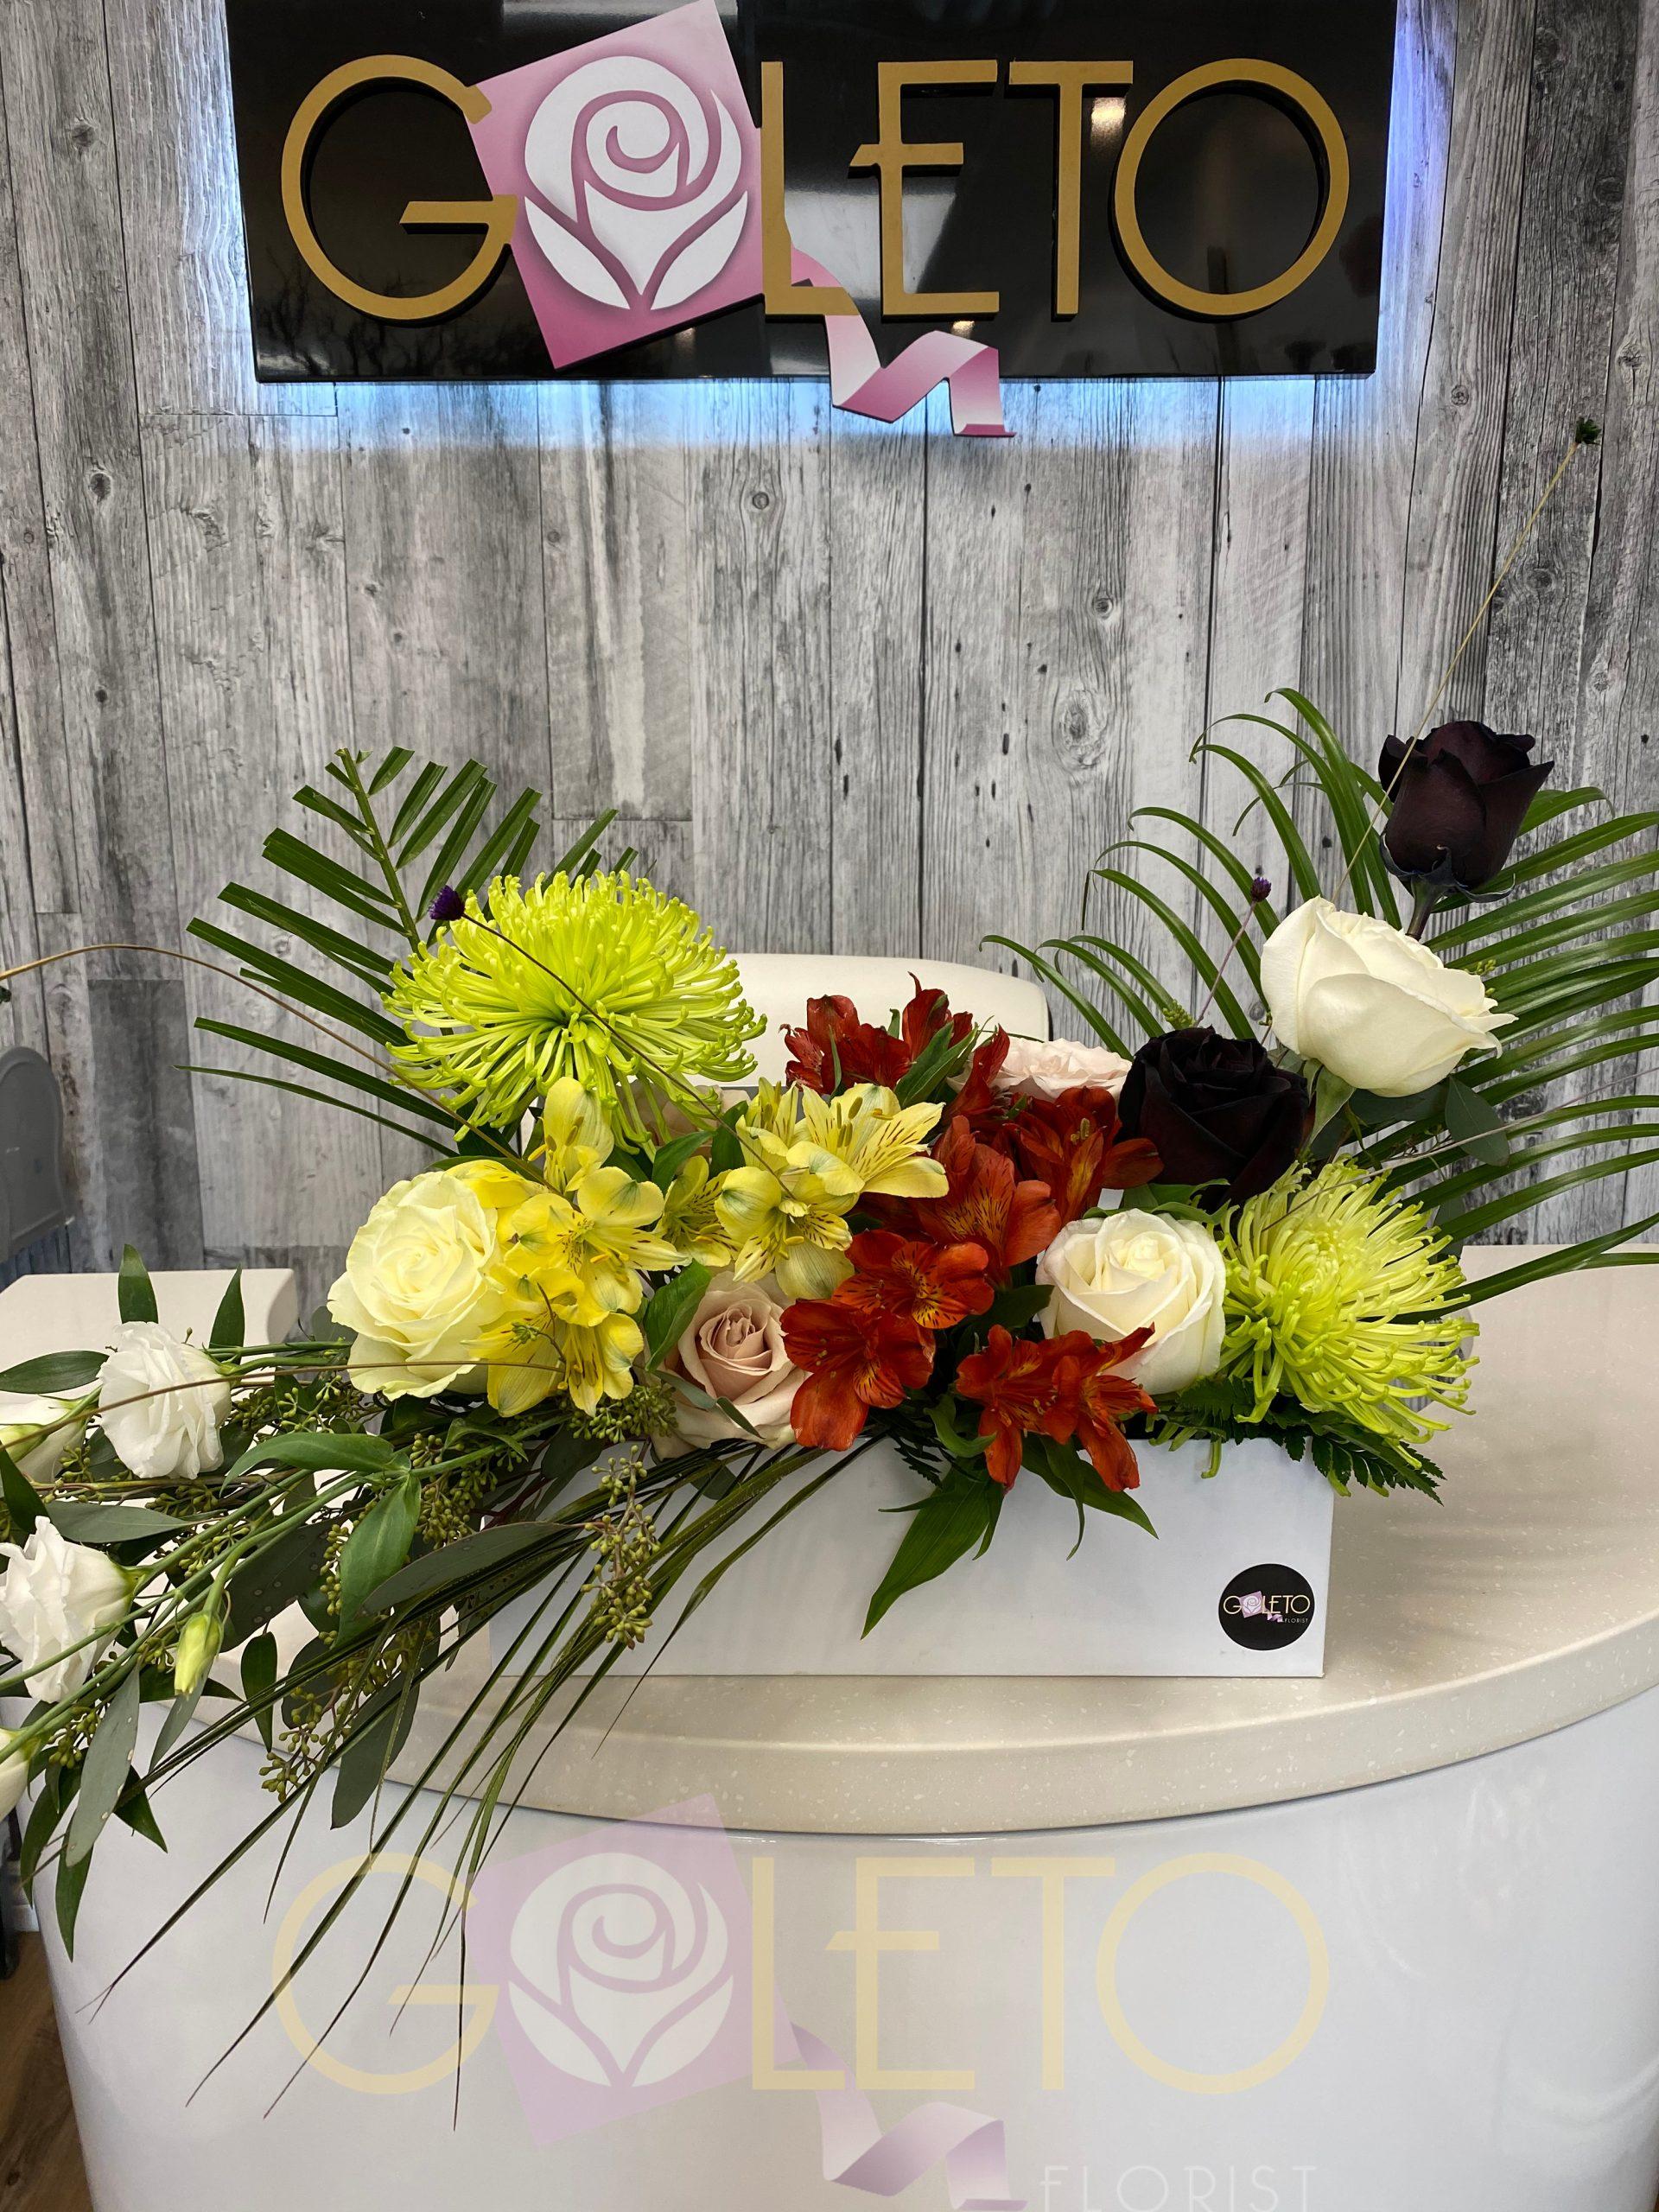 Goleto Flower Shop - Flowers in a box